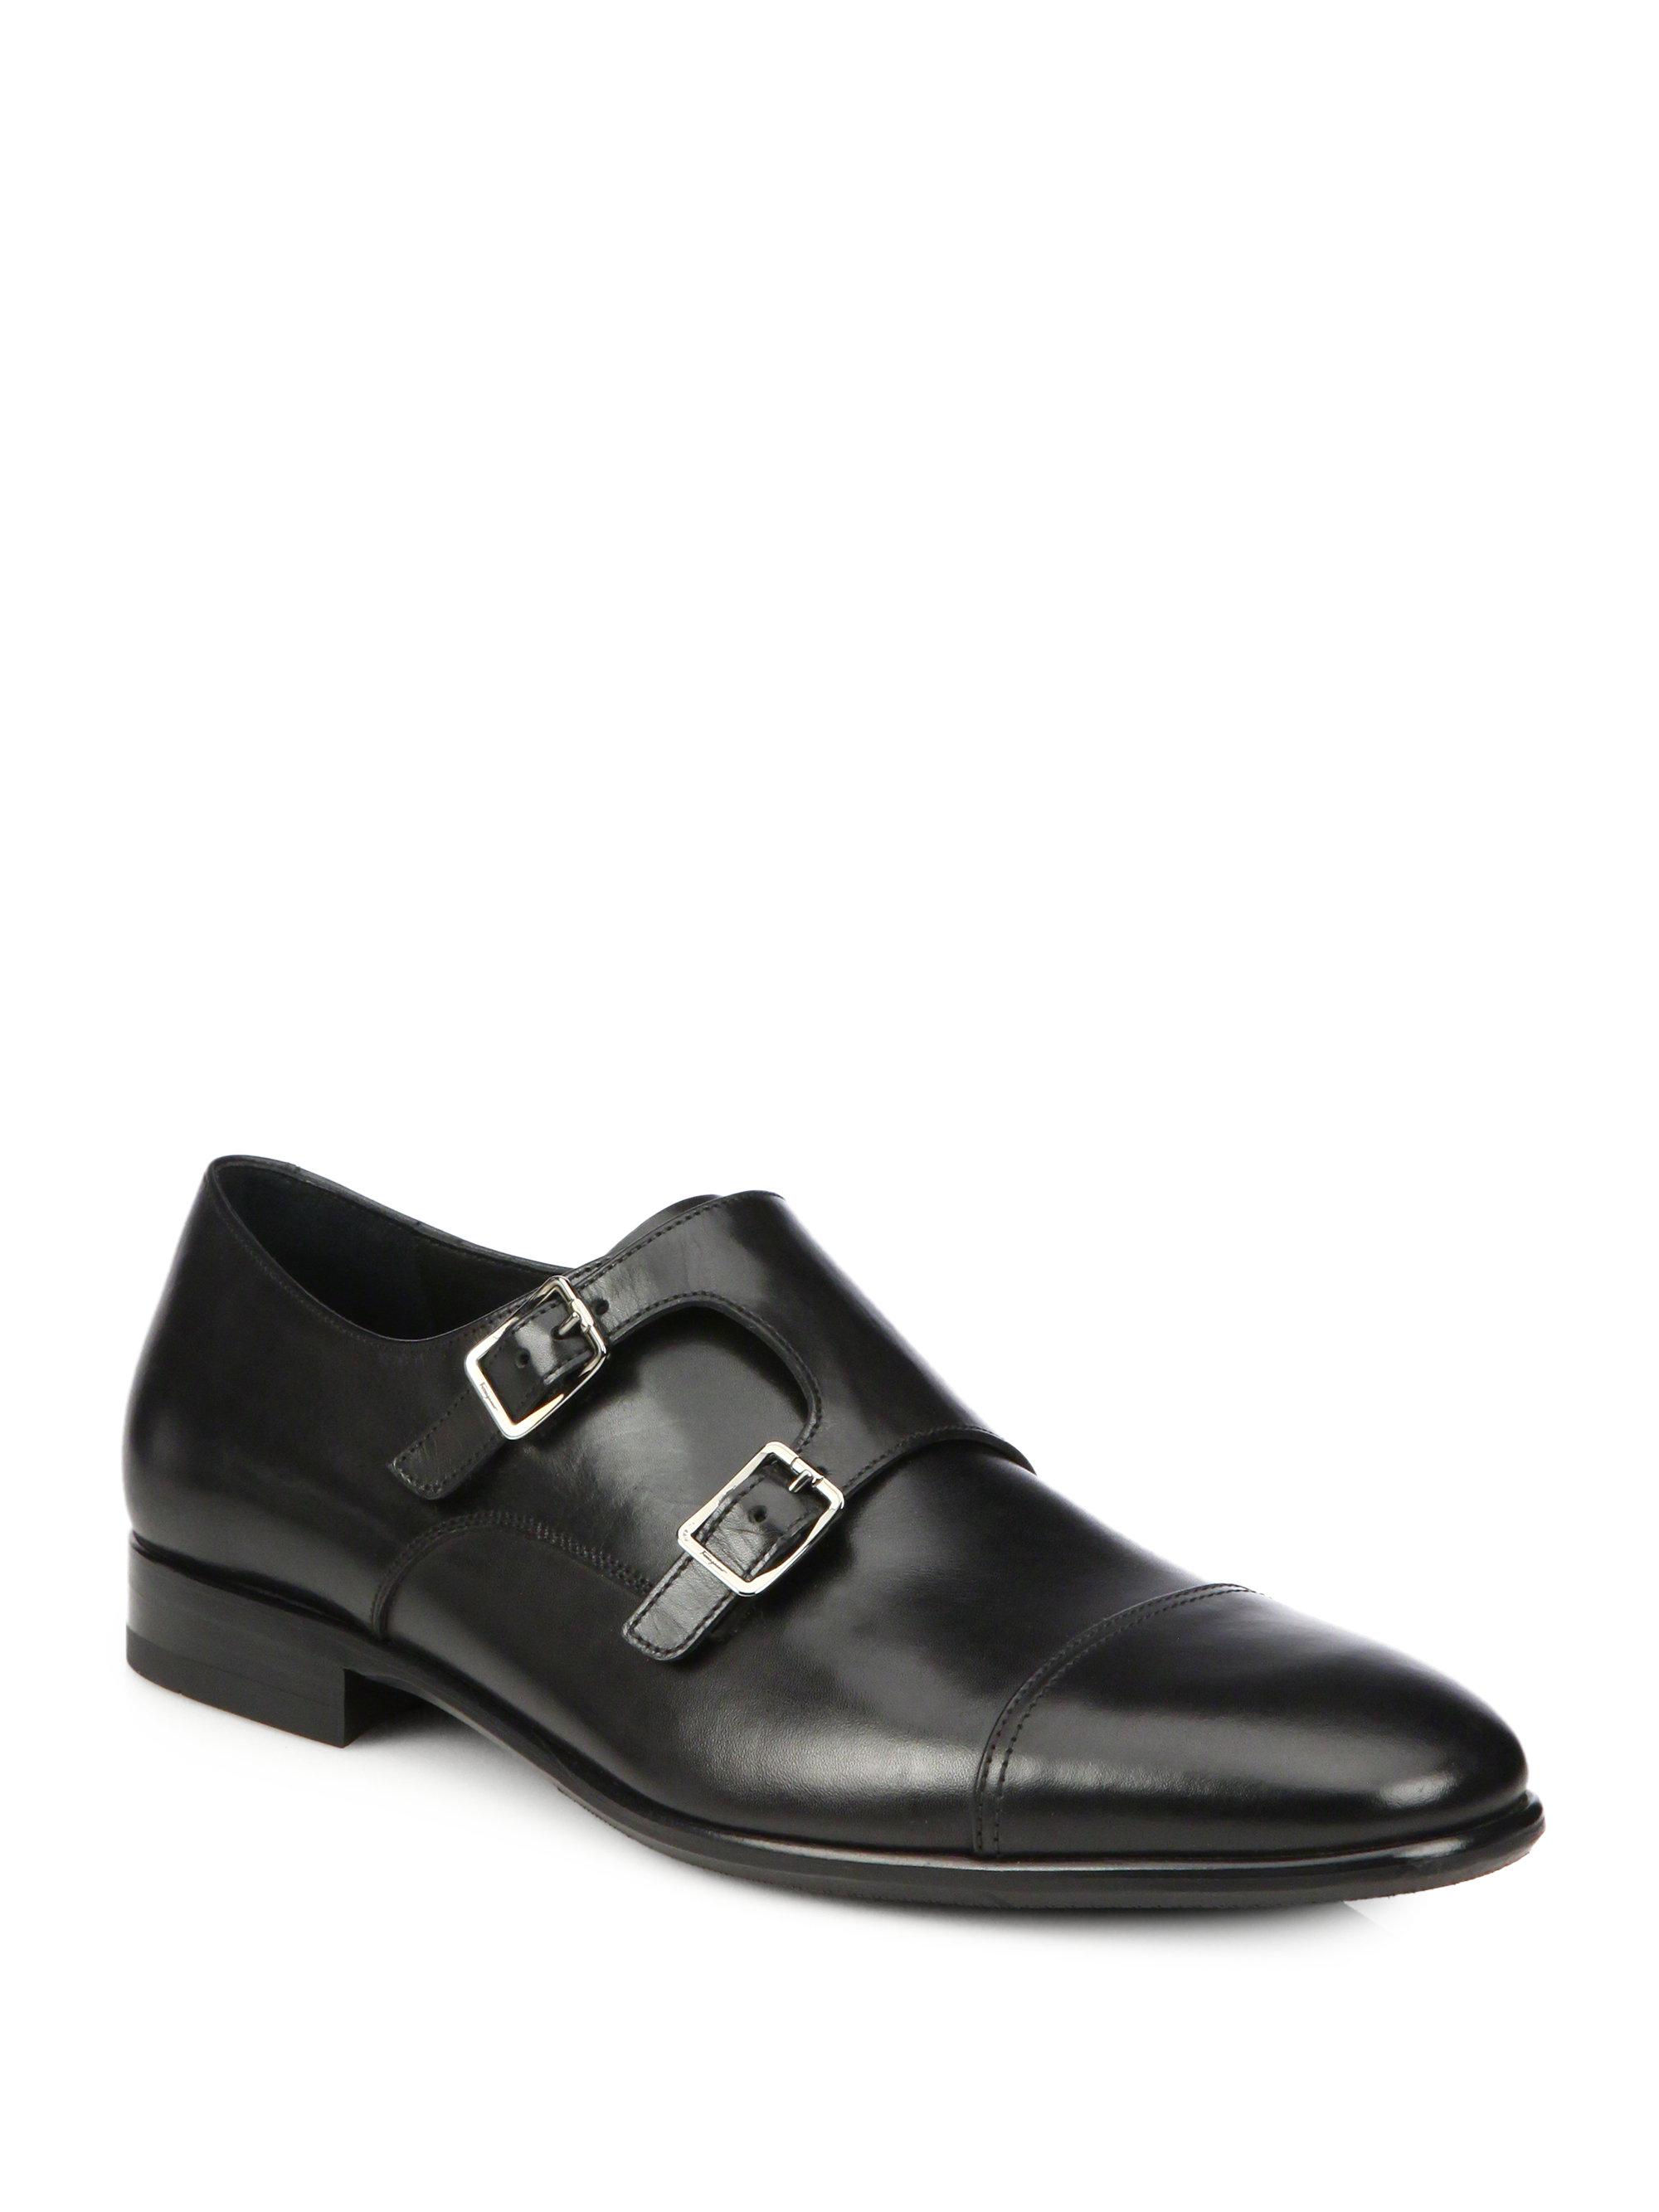 Ferragamo Ferragamo Mens Shoes In Black For Men Lyst